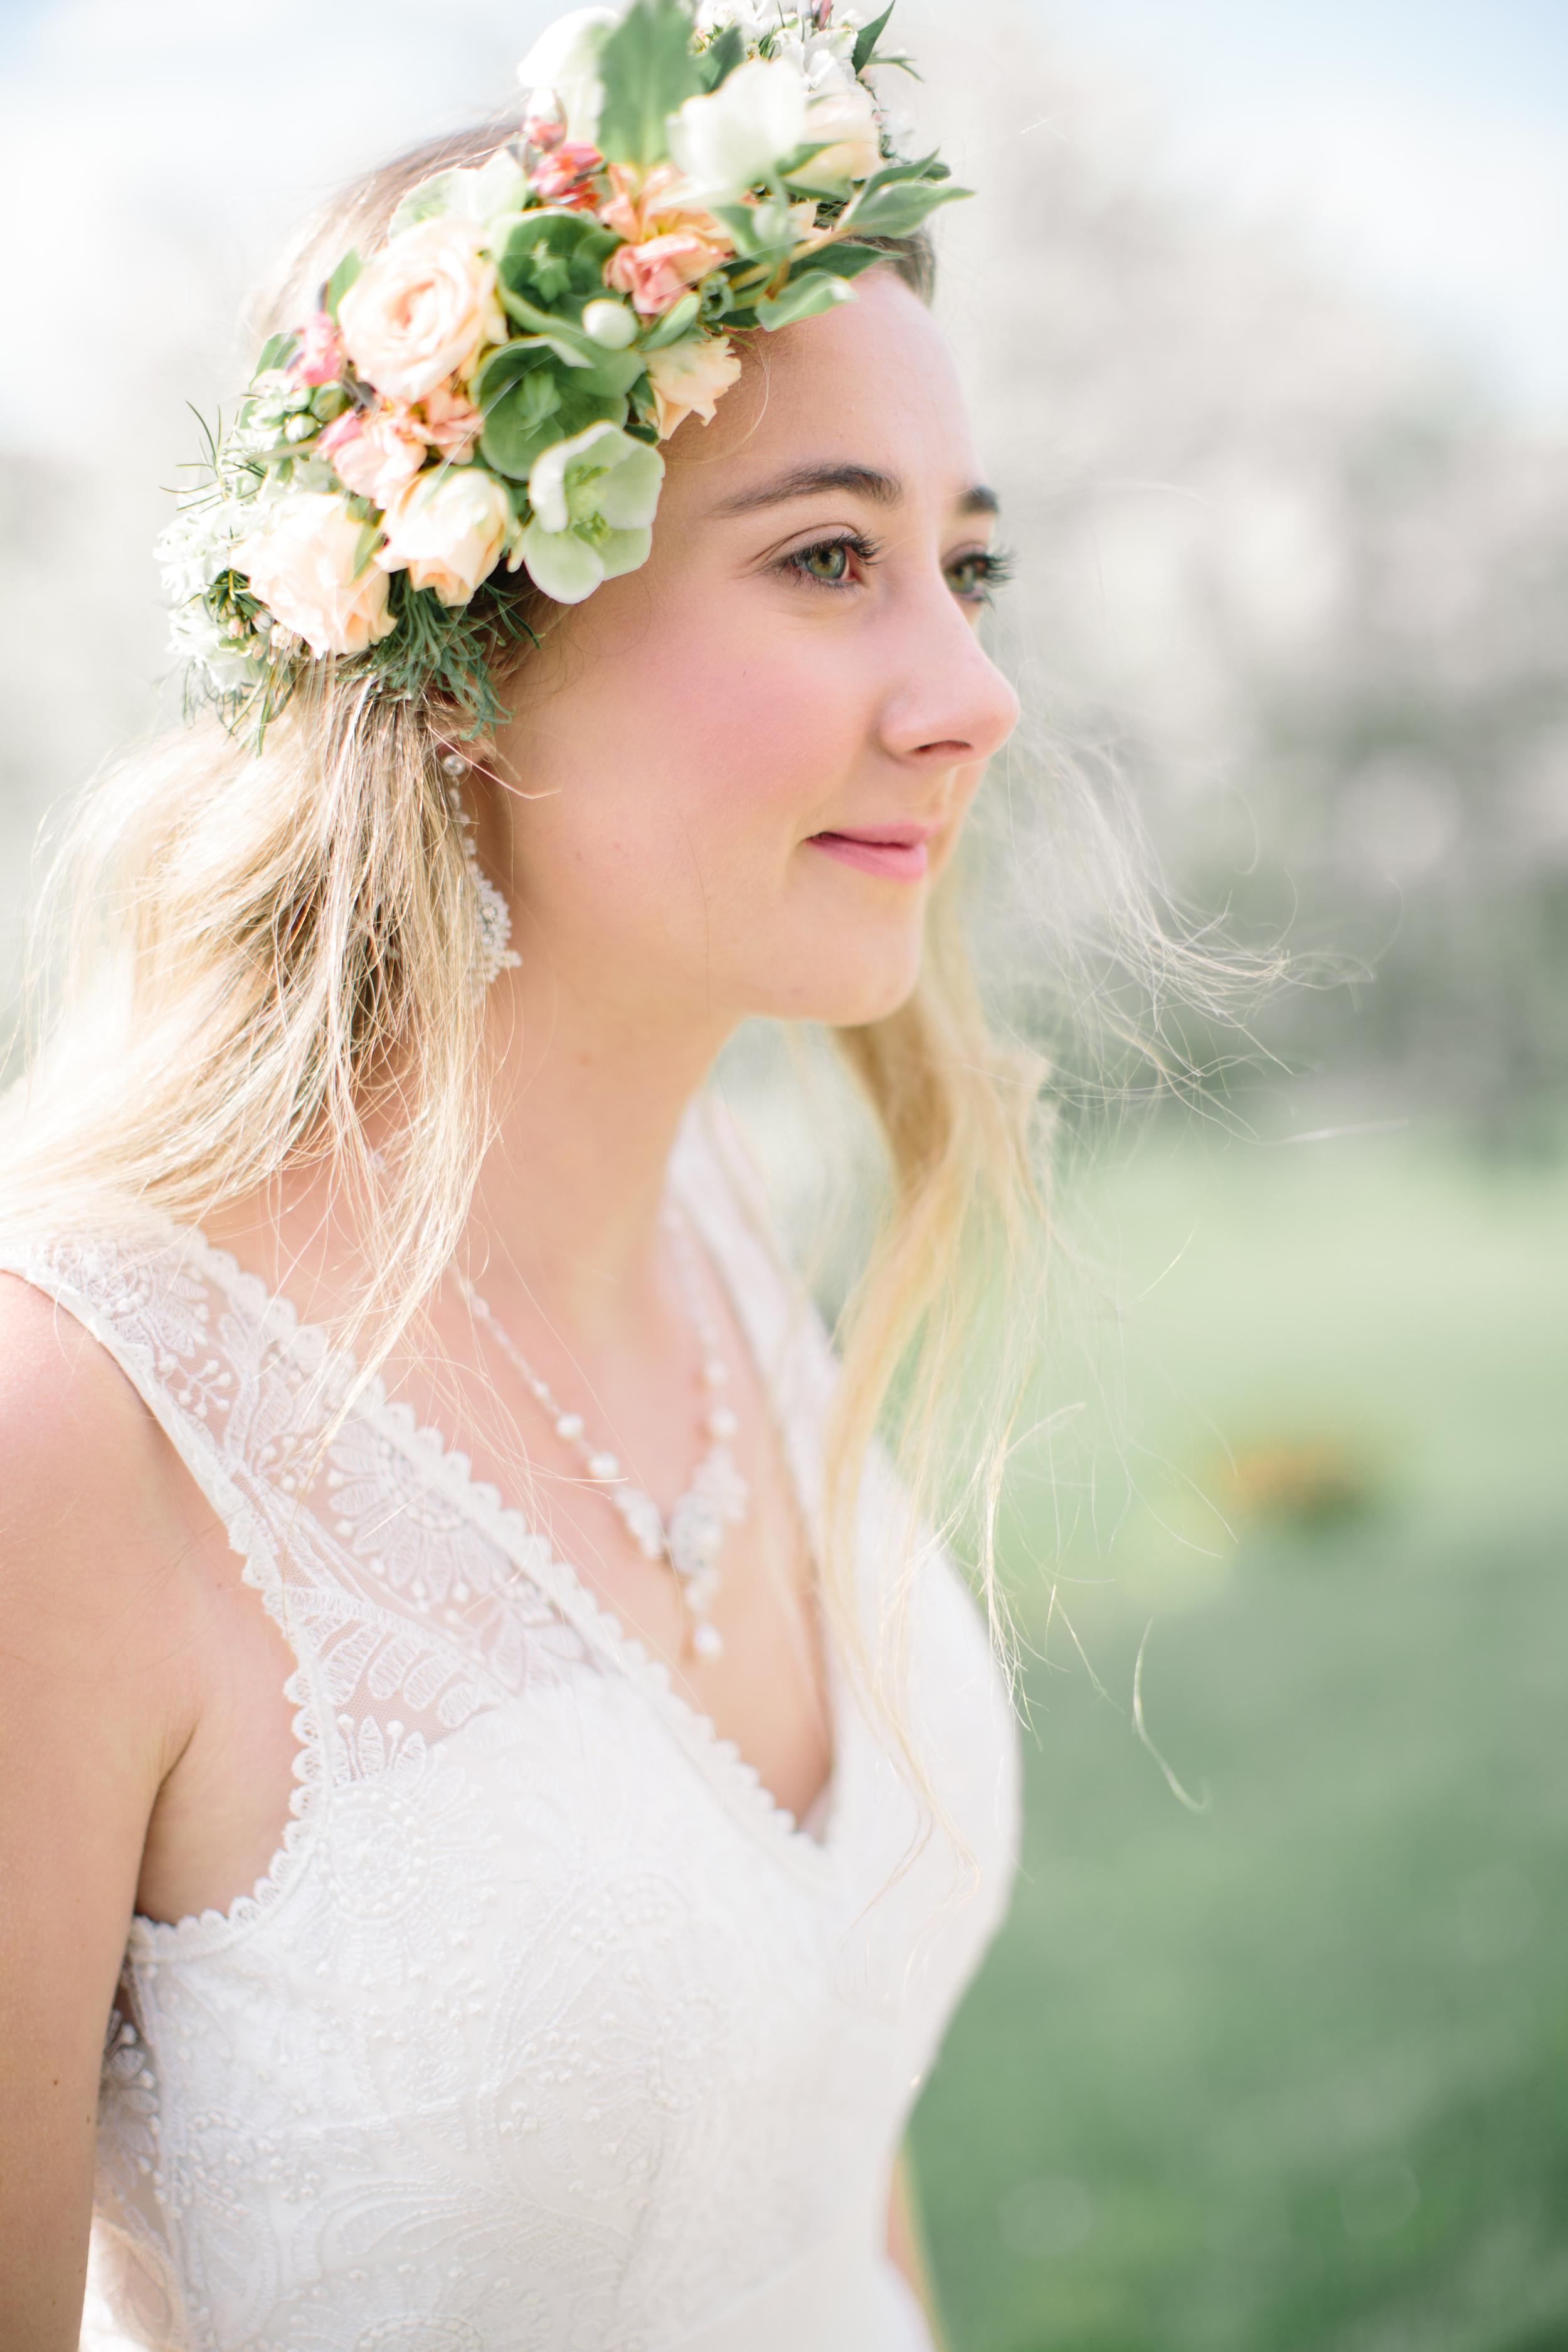 Vermont Apple Blossom Wedding Inspiration   Lace Bridal Jewelry